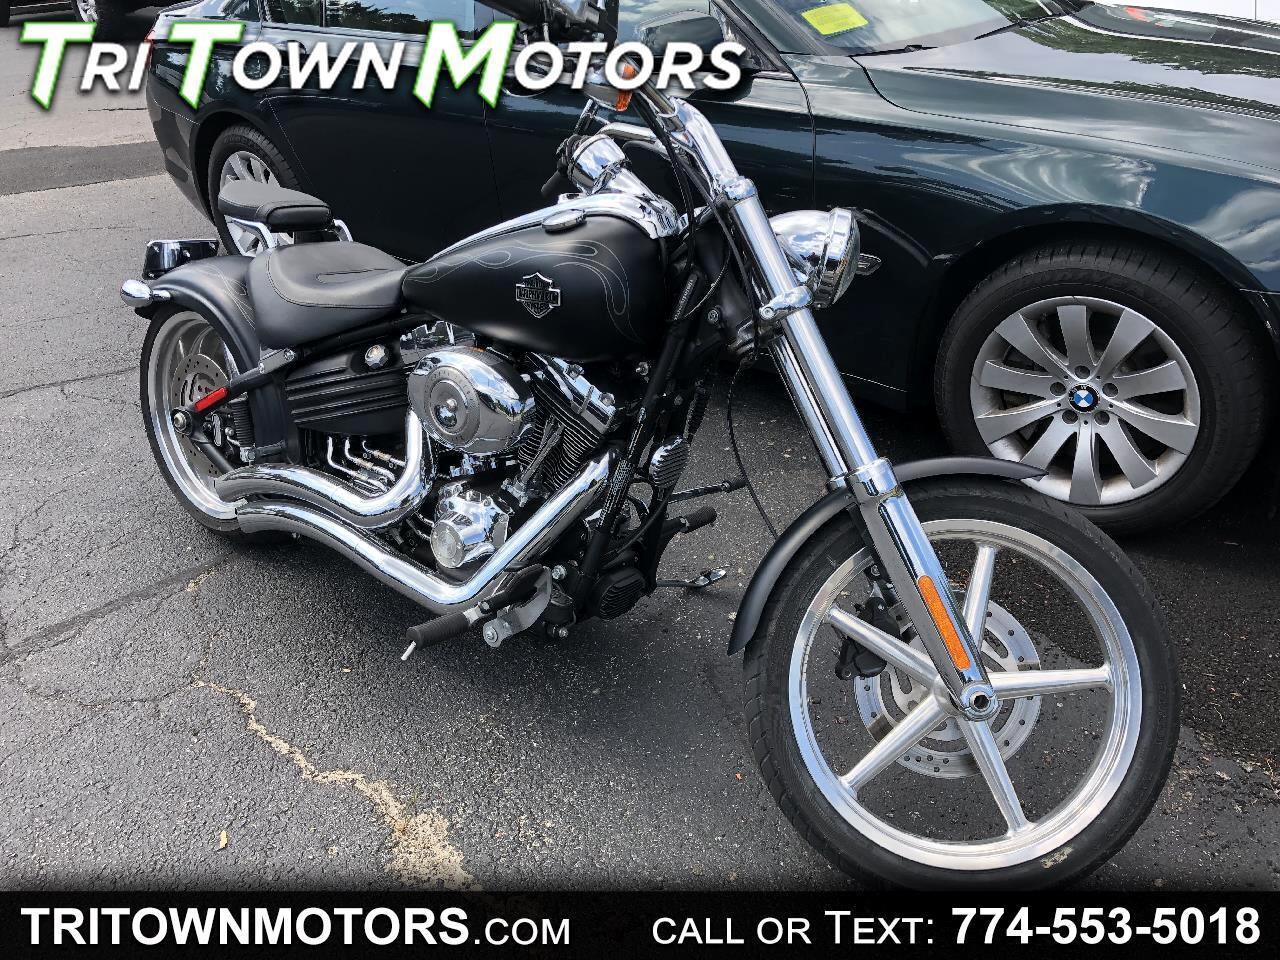 Harley-Davidson FXCWC  2011